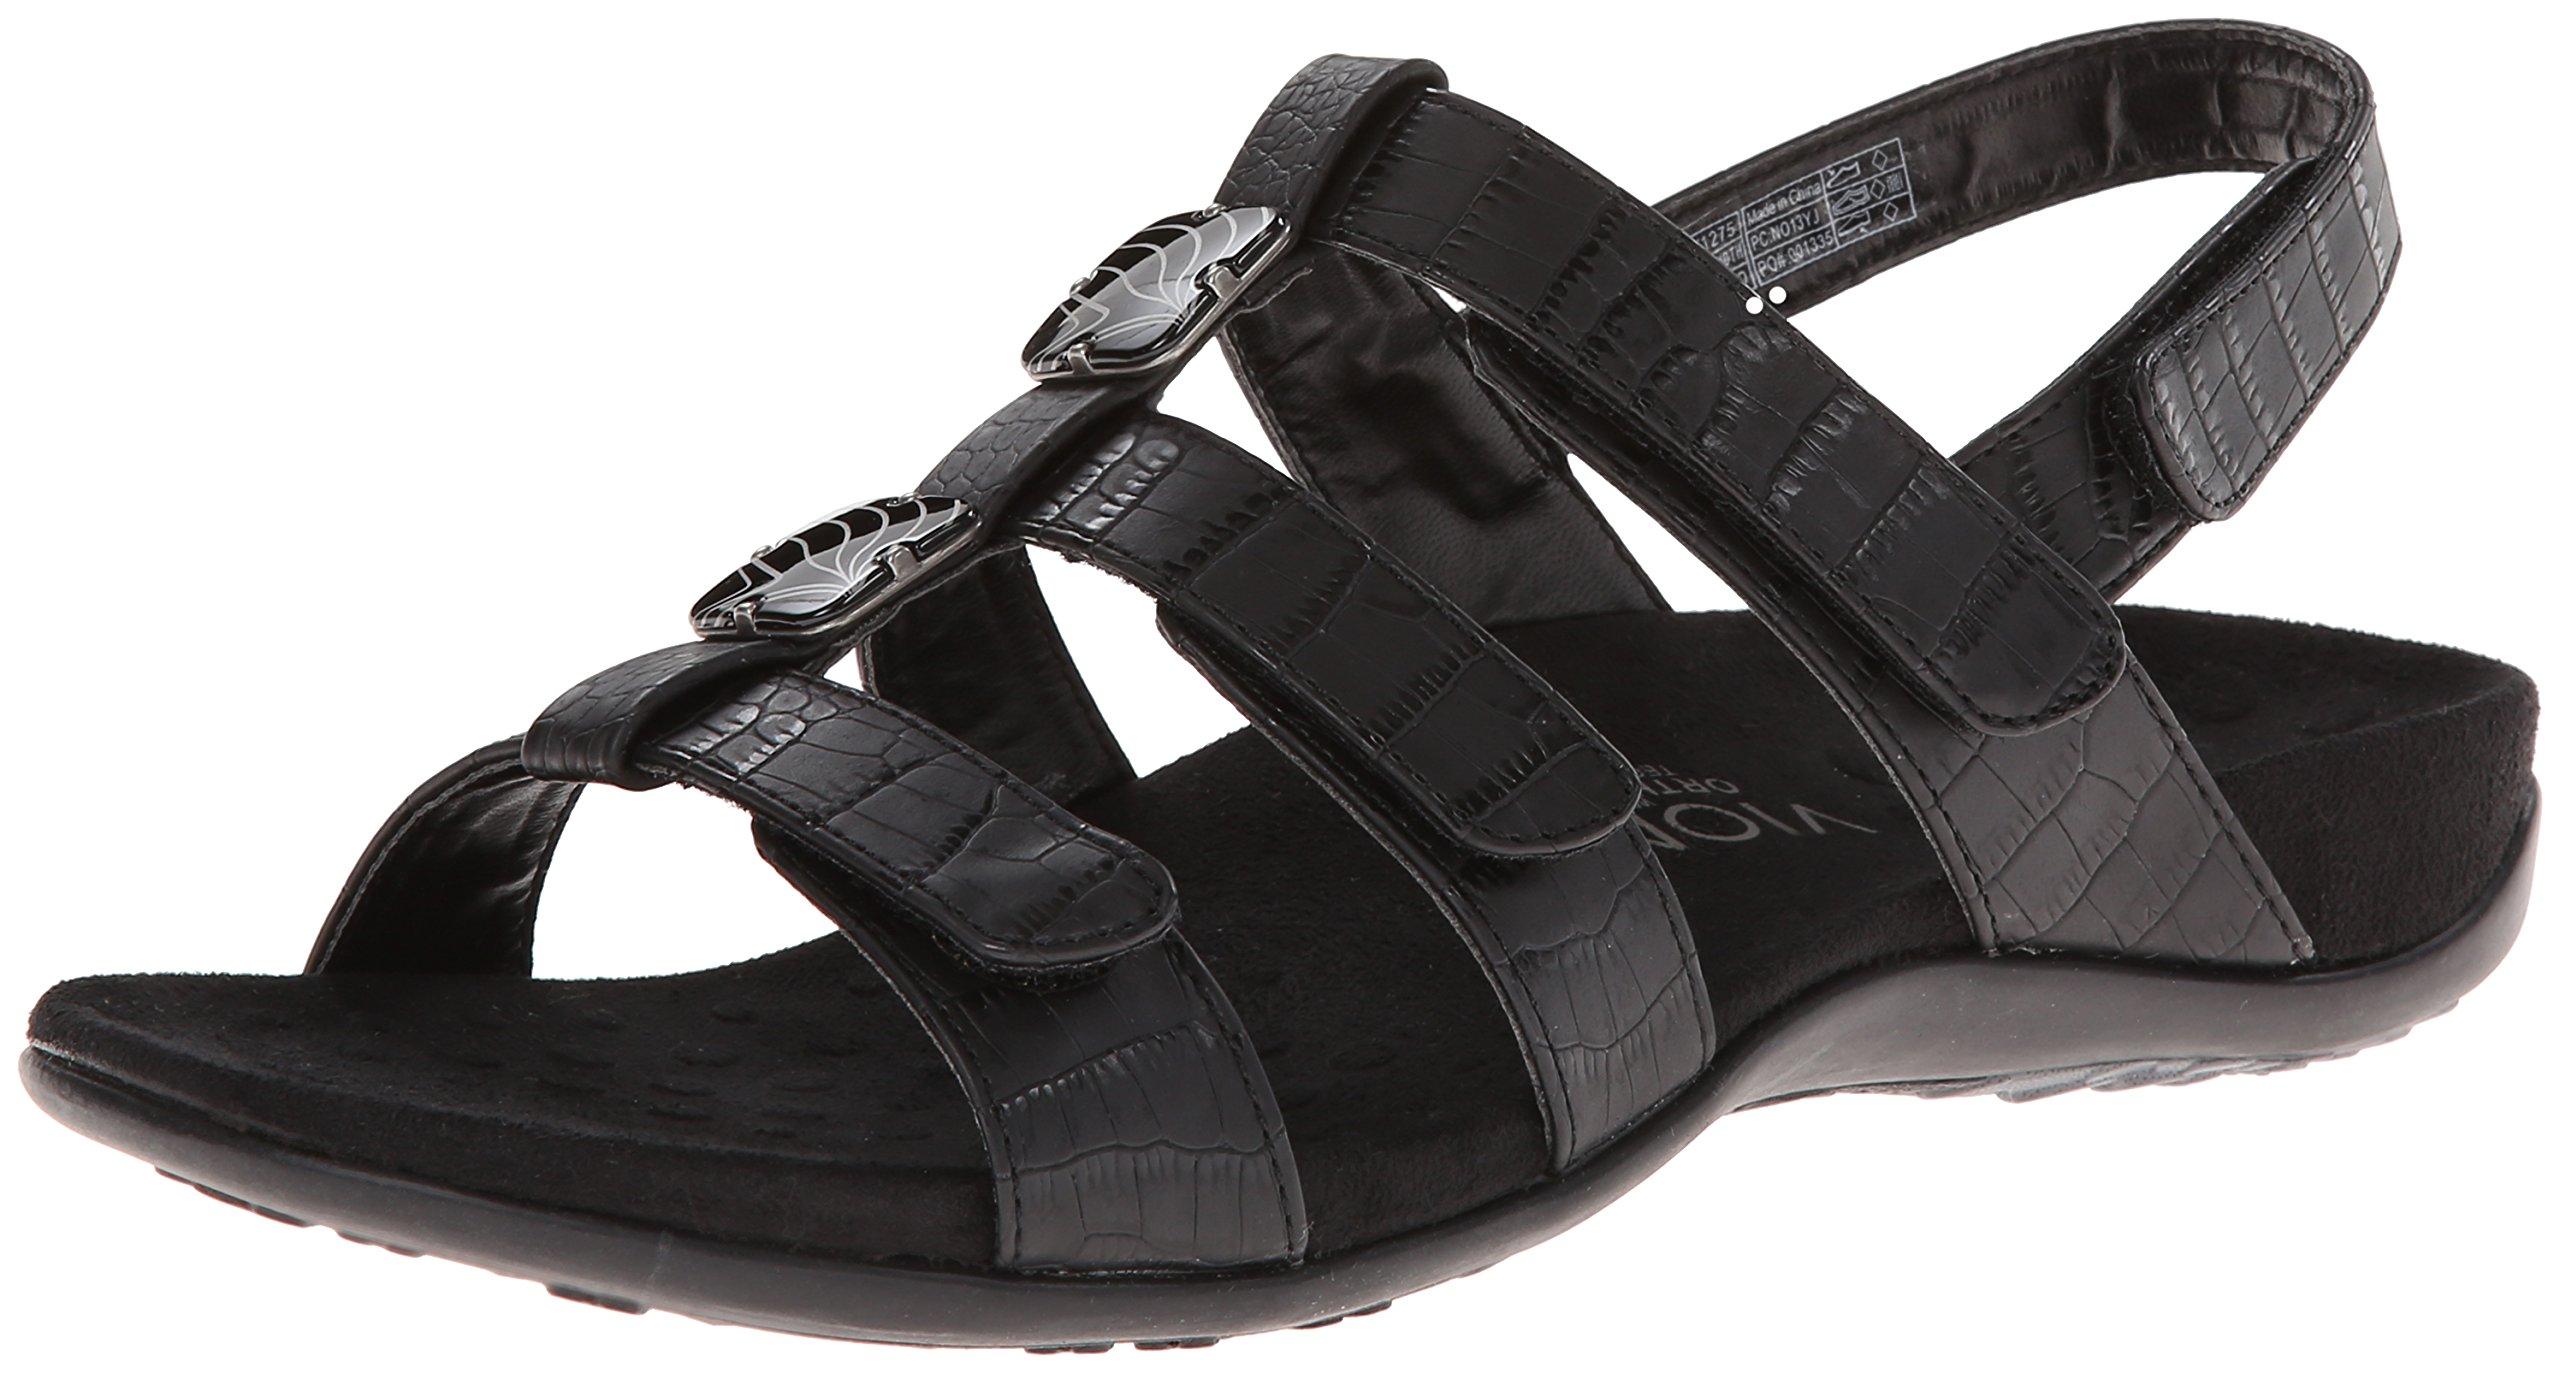 Vionic Amber - Womens Slide Sandal - Orth Black Crocodile - 9 Medium